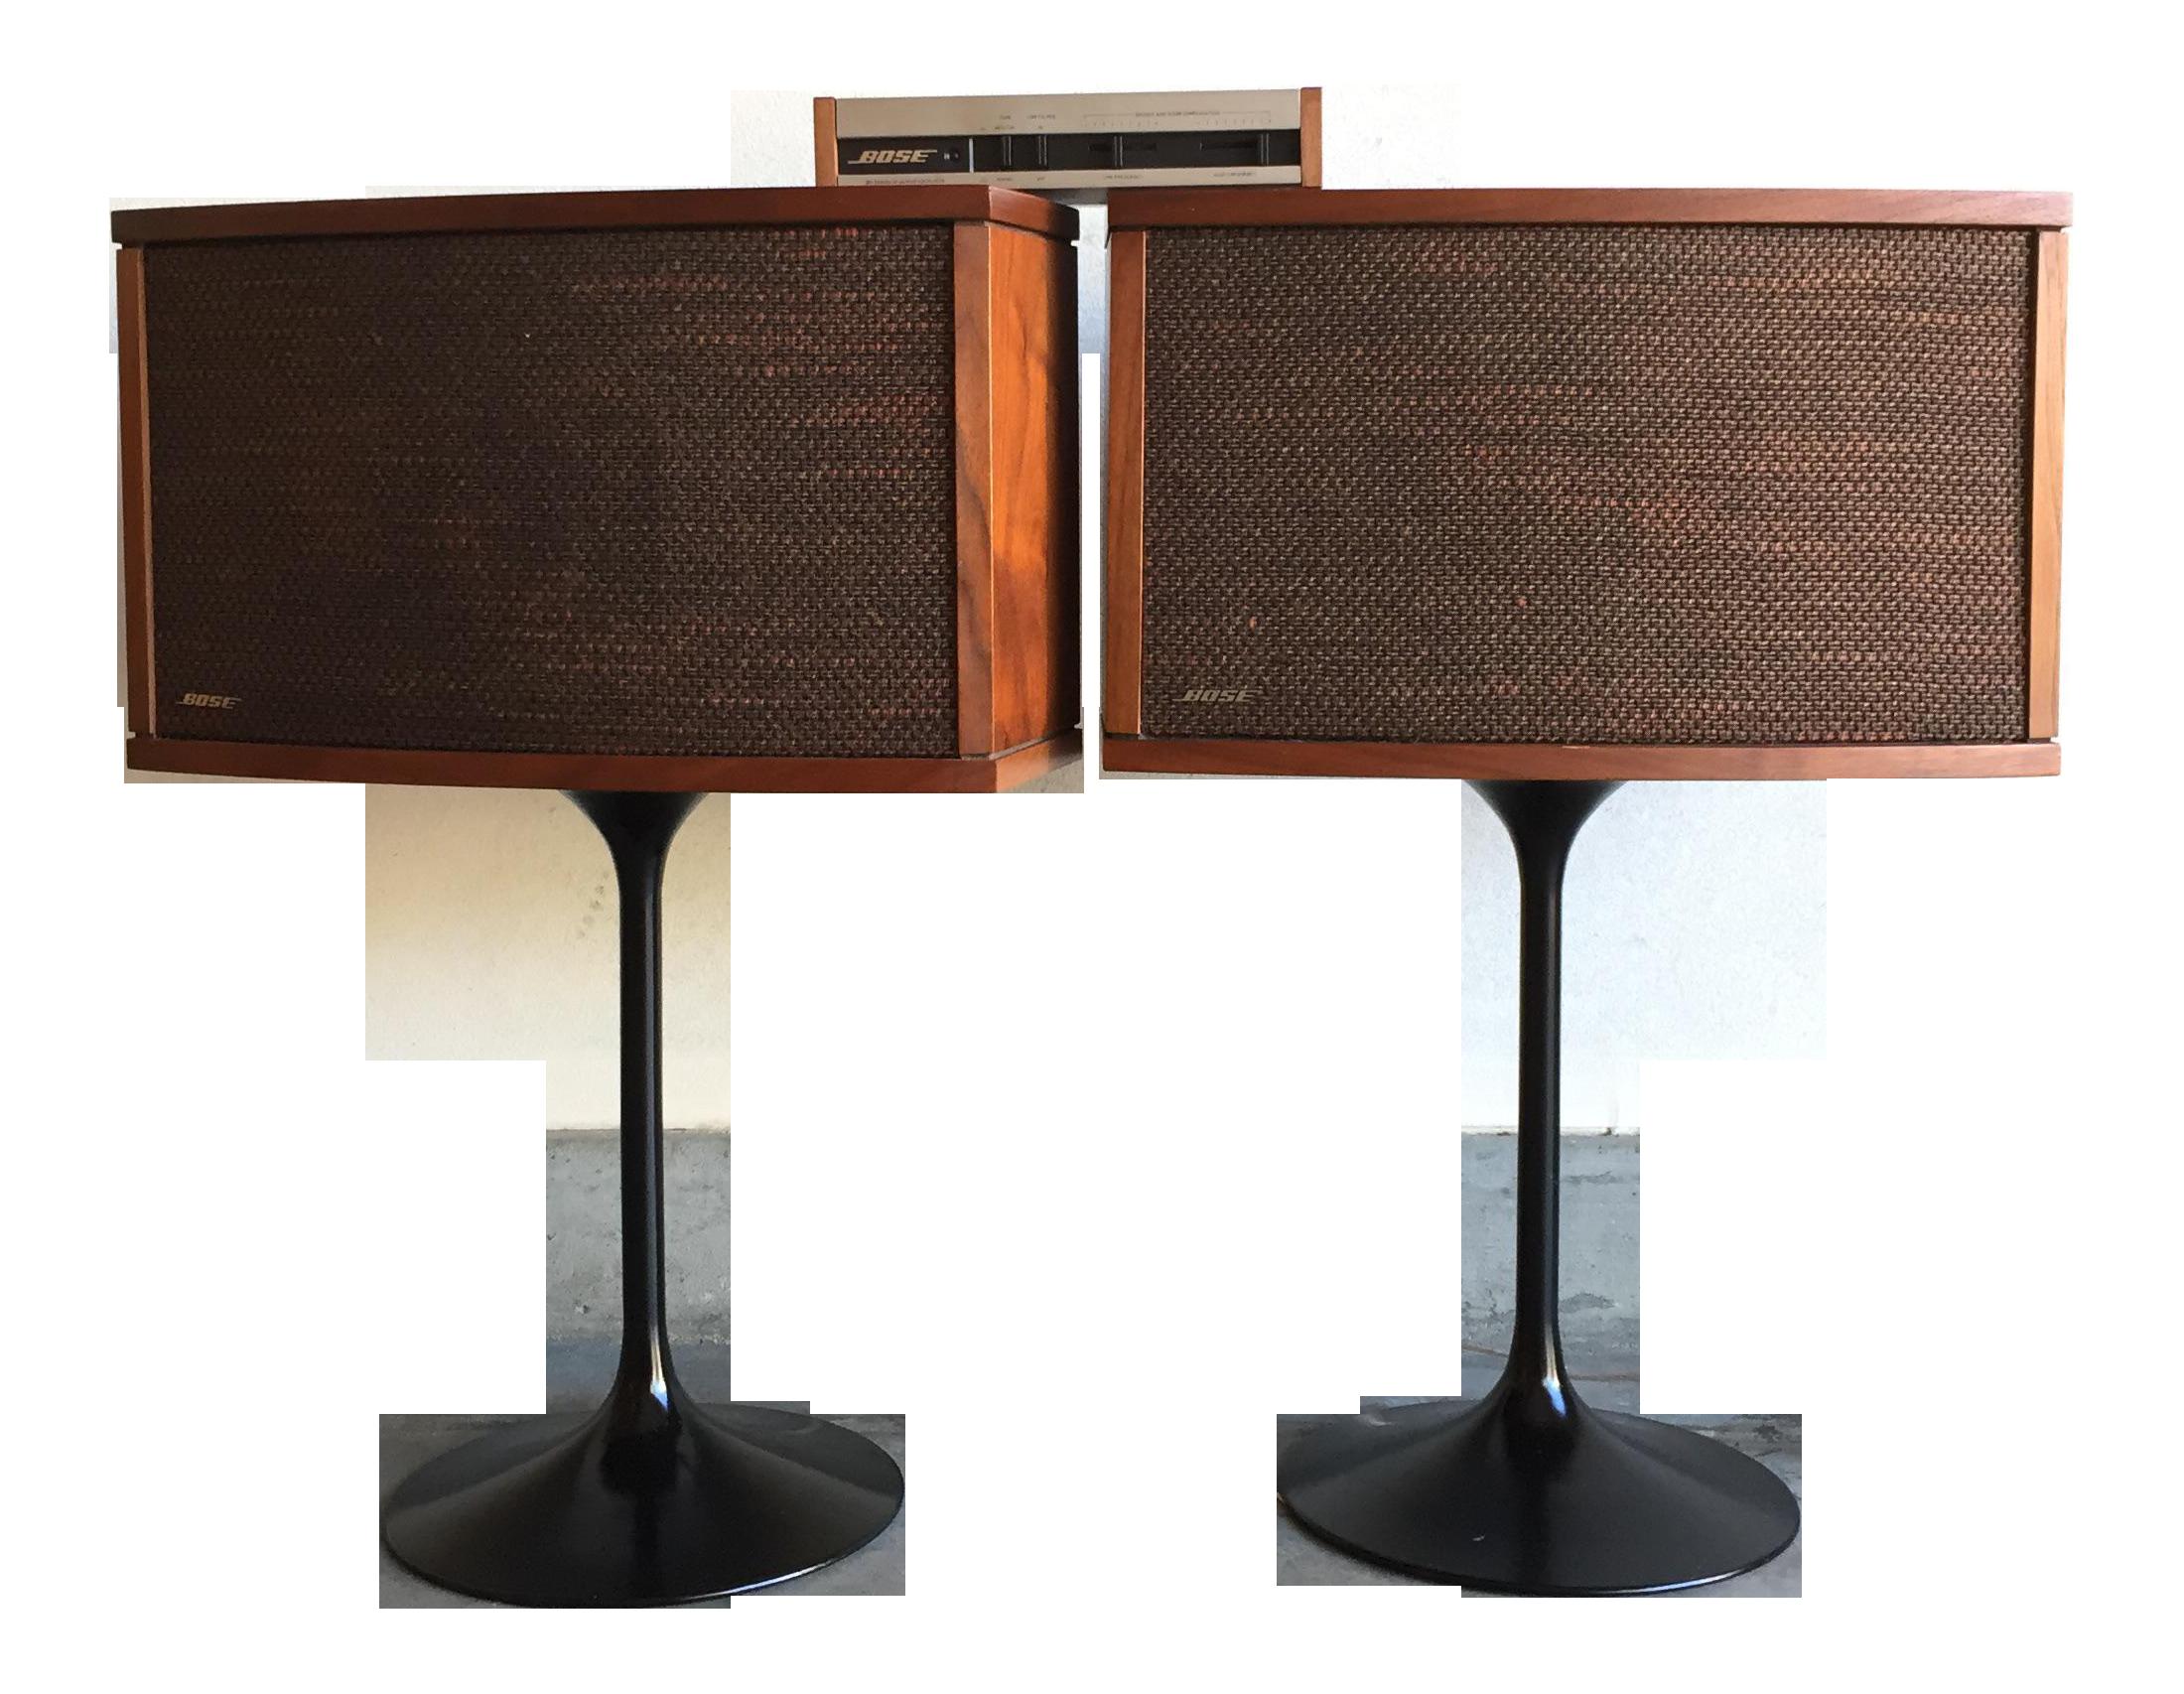 vintage 1978 bose 901 series iv speakers stands equalizer manual rh chairish com bose speaker stands ufs-20 manual Bose Outdoor Speakers